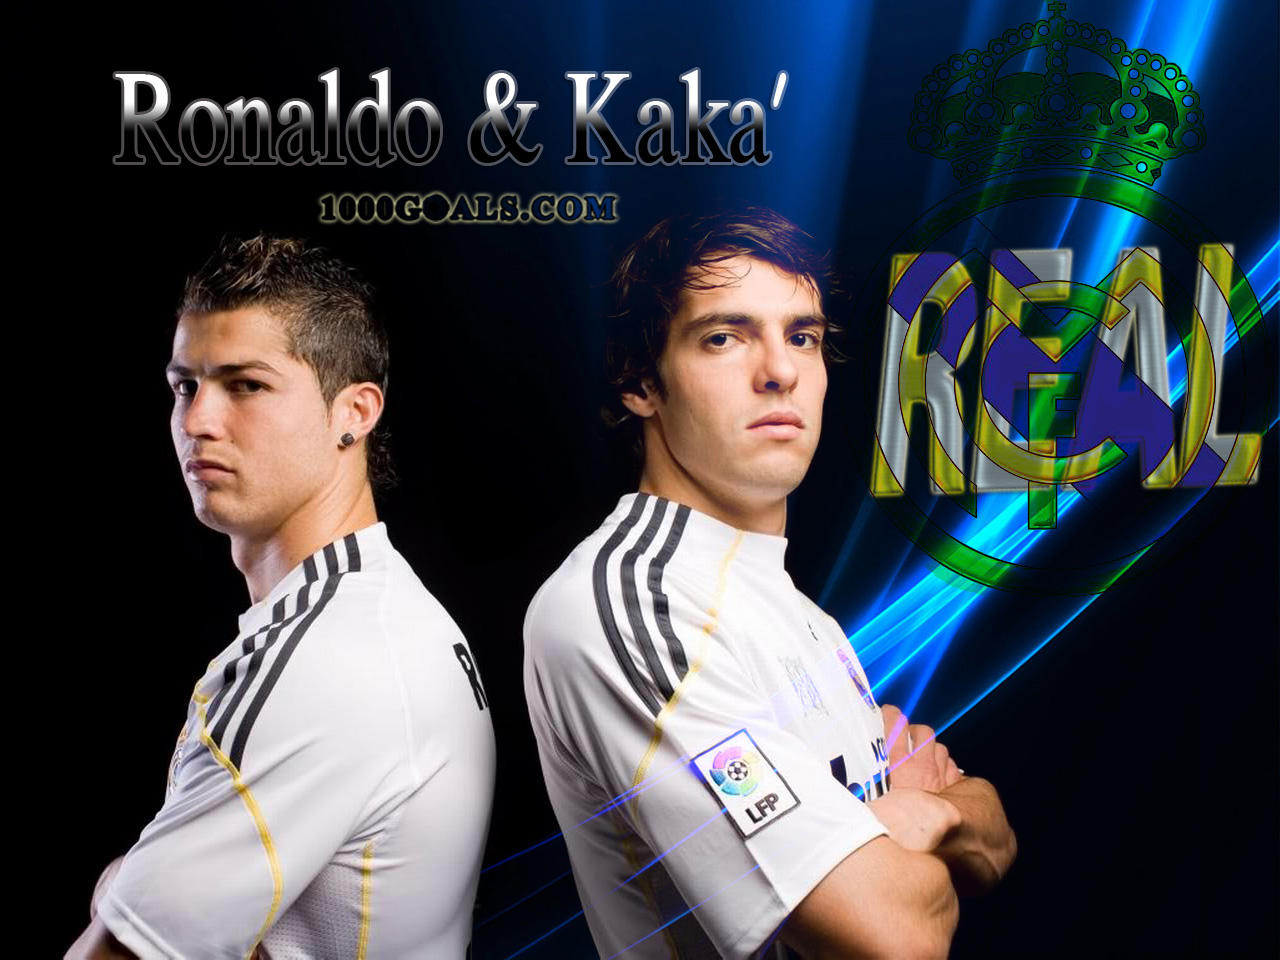 http://4.bp.blogspot.com/-m0Qee2Gi1ds/TsRdNHPwn_I/AAAAAAAAA58/bGxMNBl8lkk/s1600/Cristiano-Ronaldo-Real-Madrid-Wallpaper+Fondo+de+escritorio.jpg